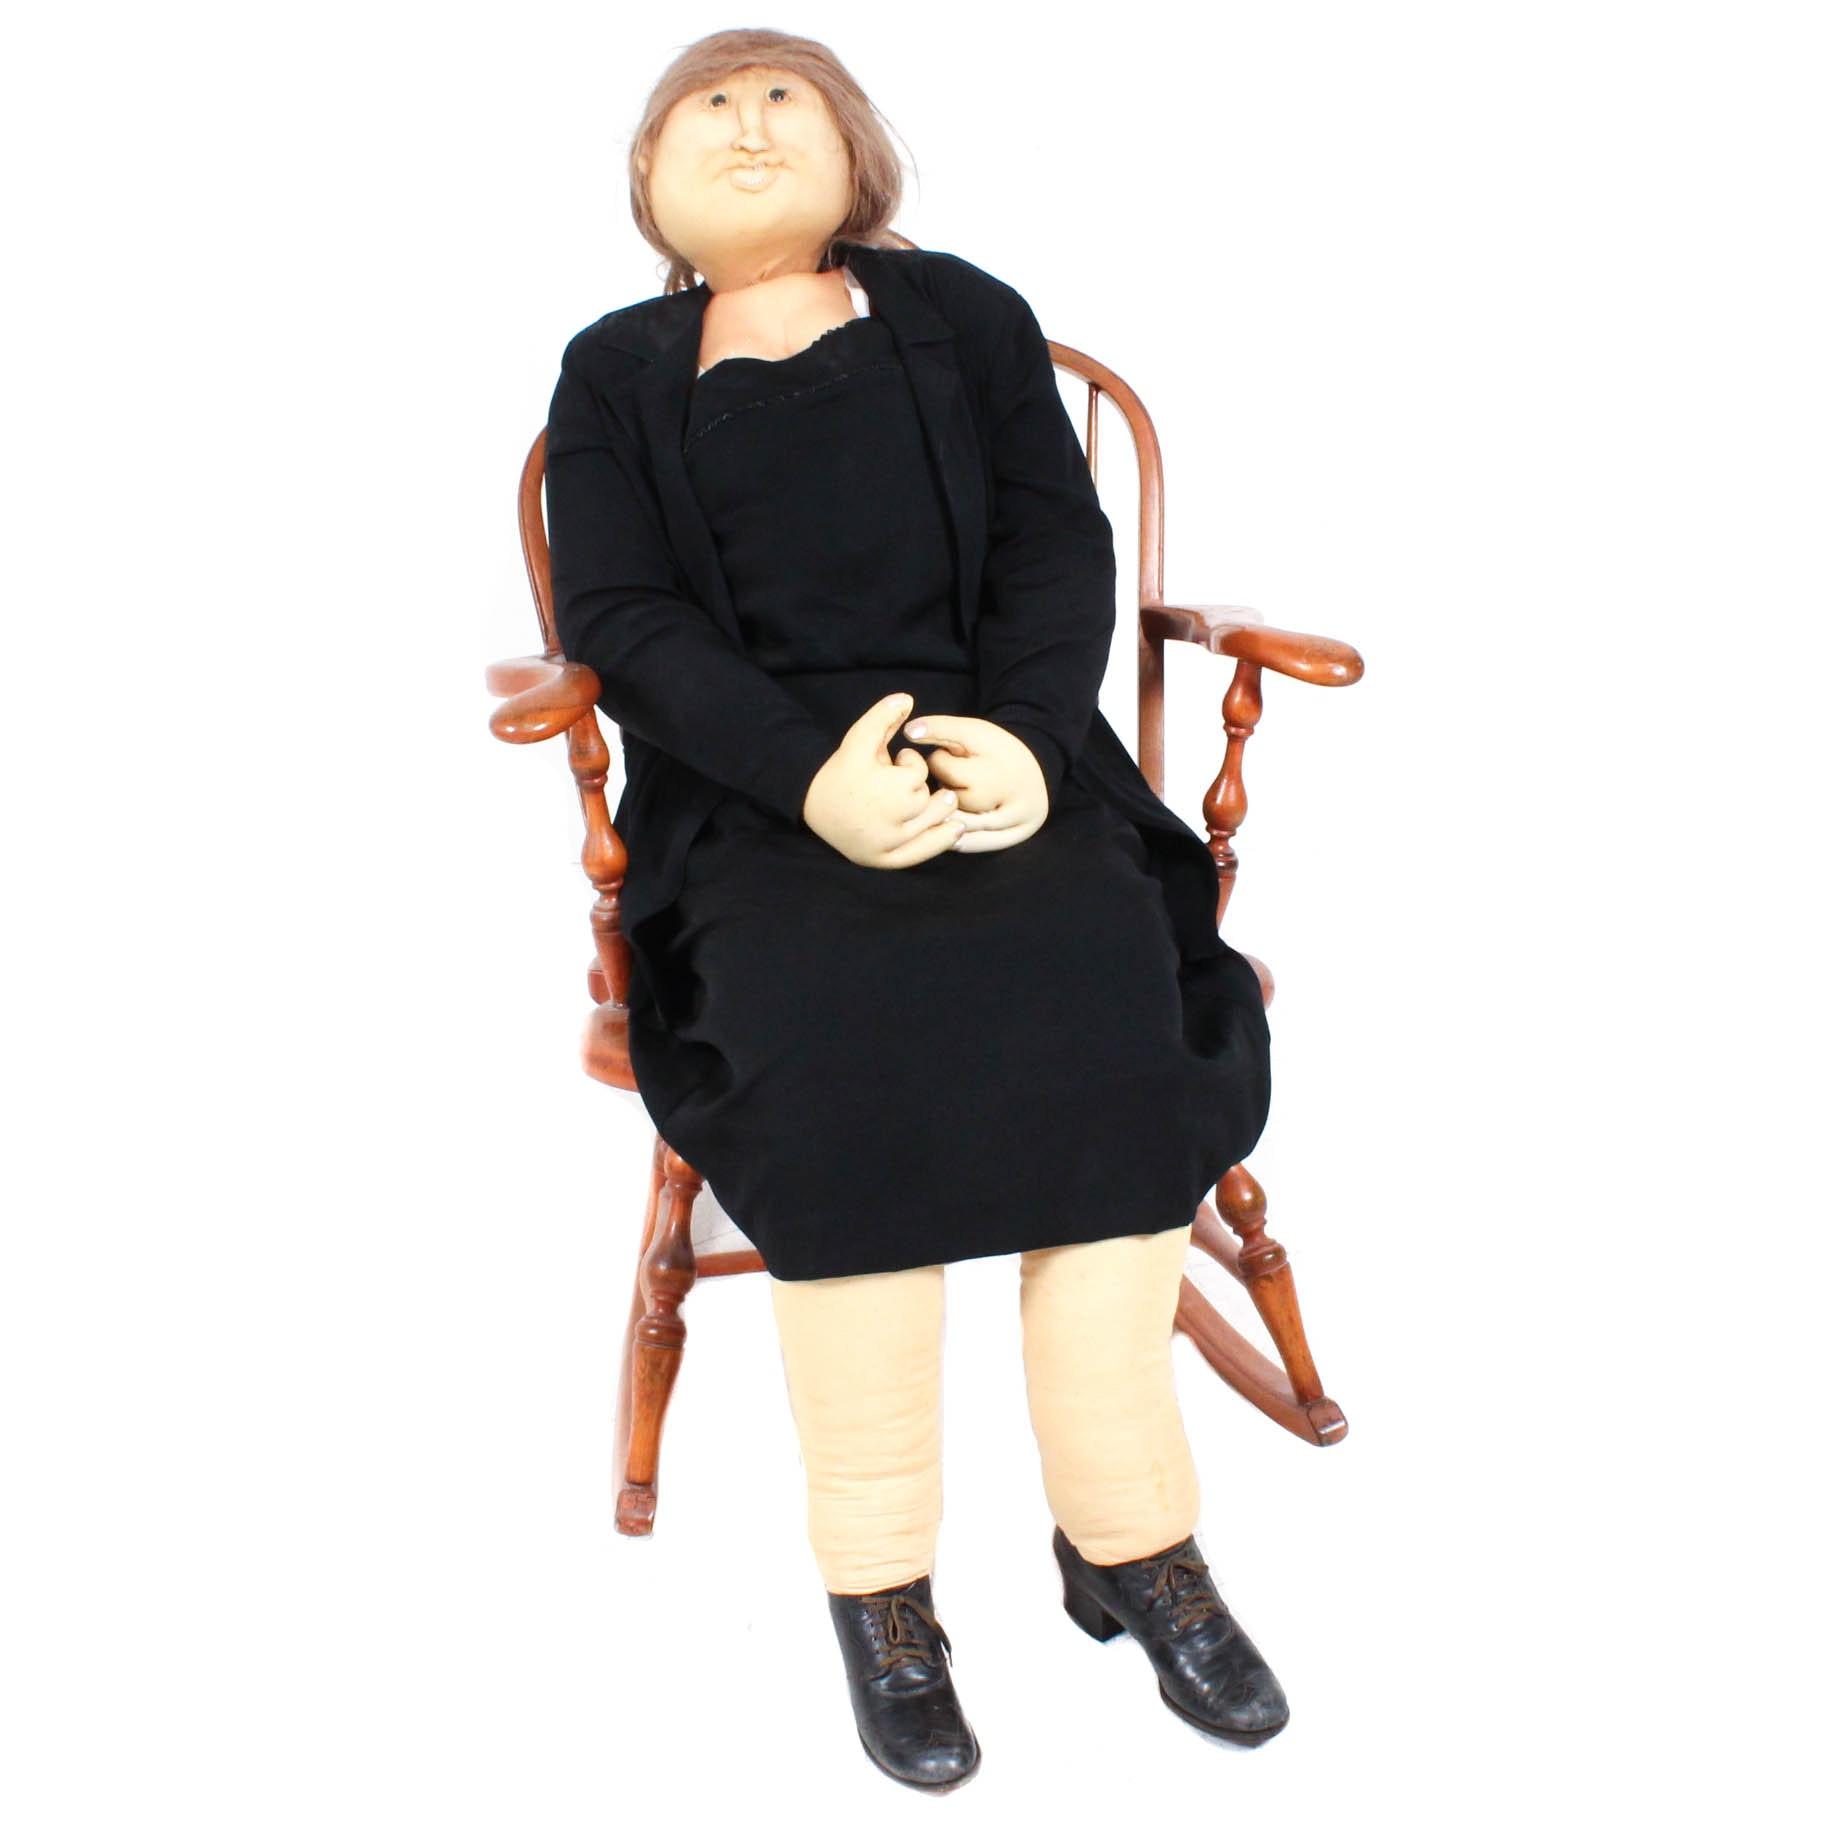 Life Size Soft Sculpture Grandma in Rocker